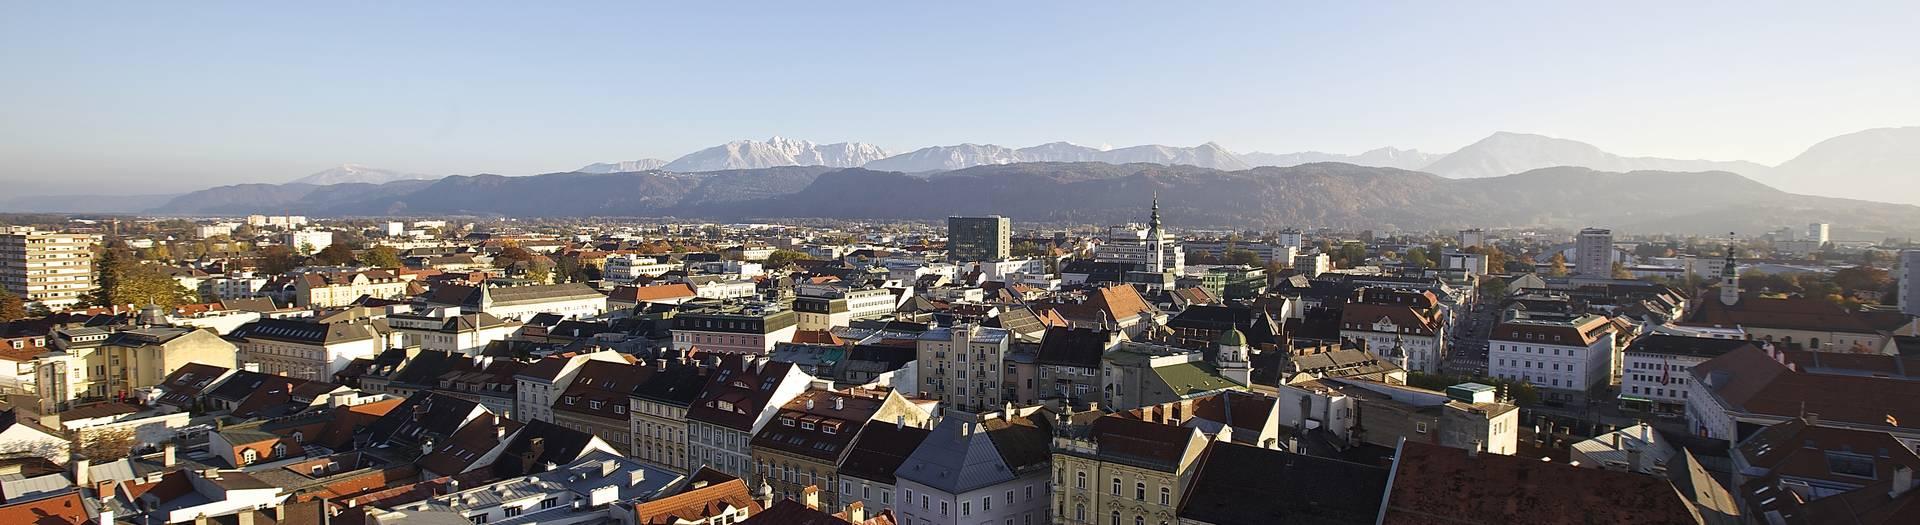 Stadtpfarrturm Klagenfurt